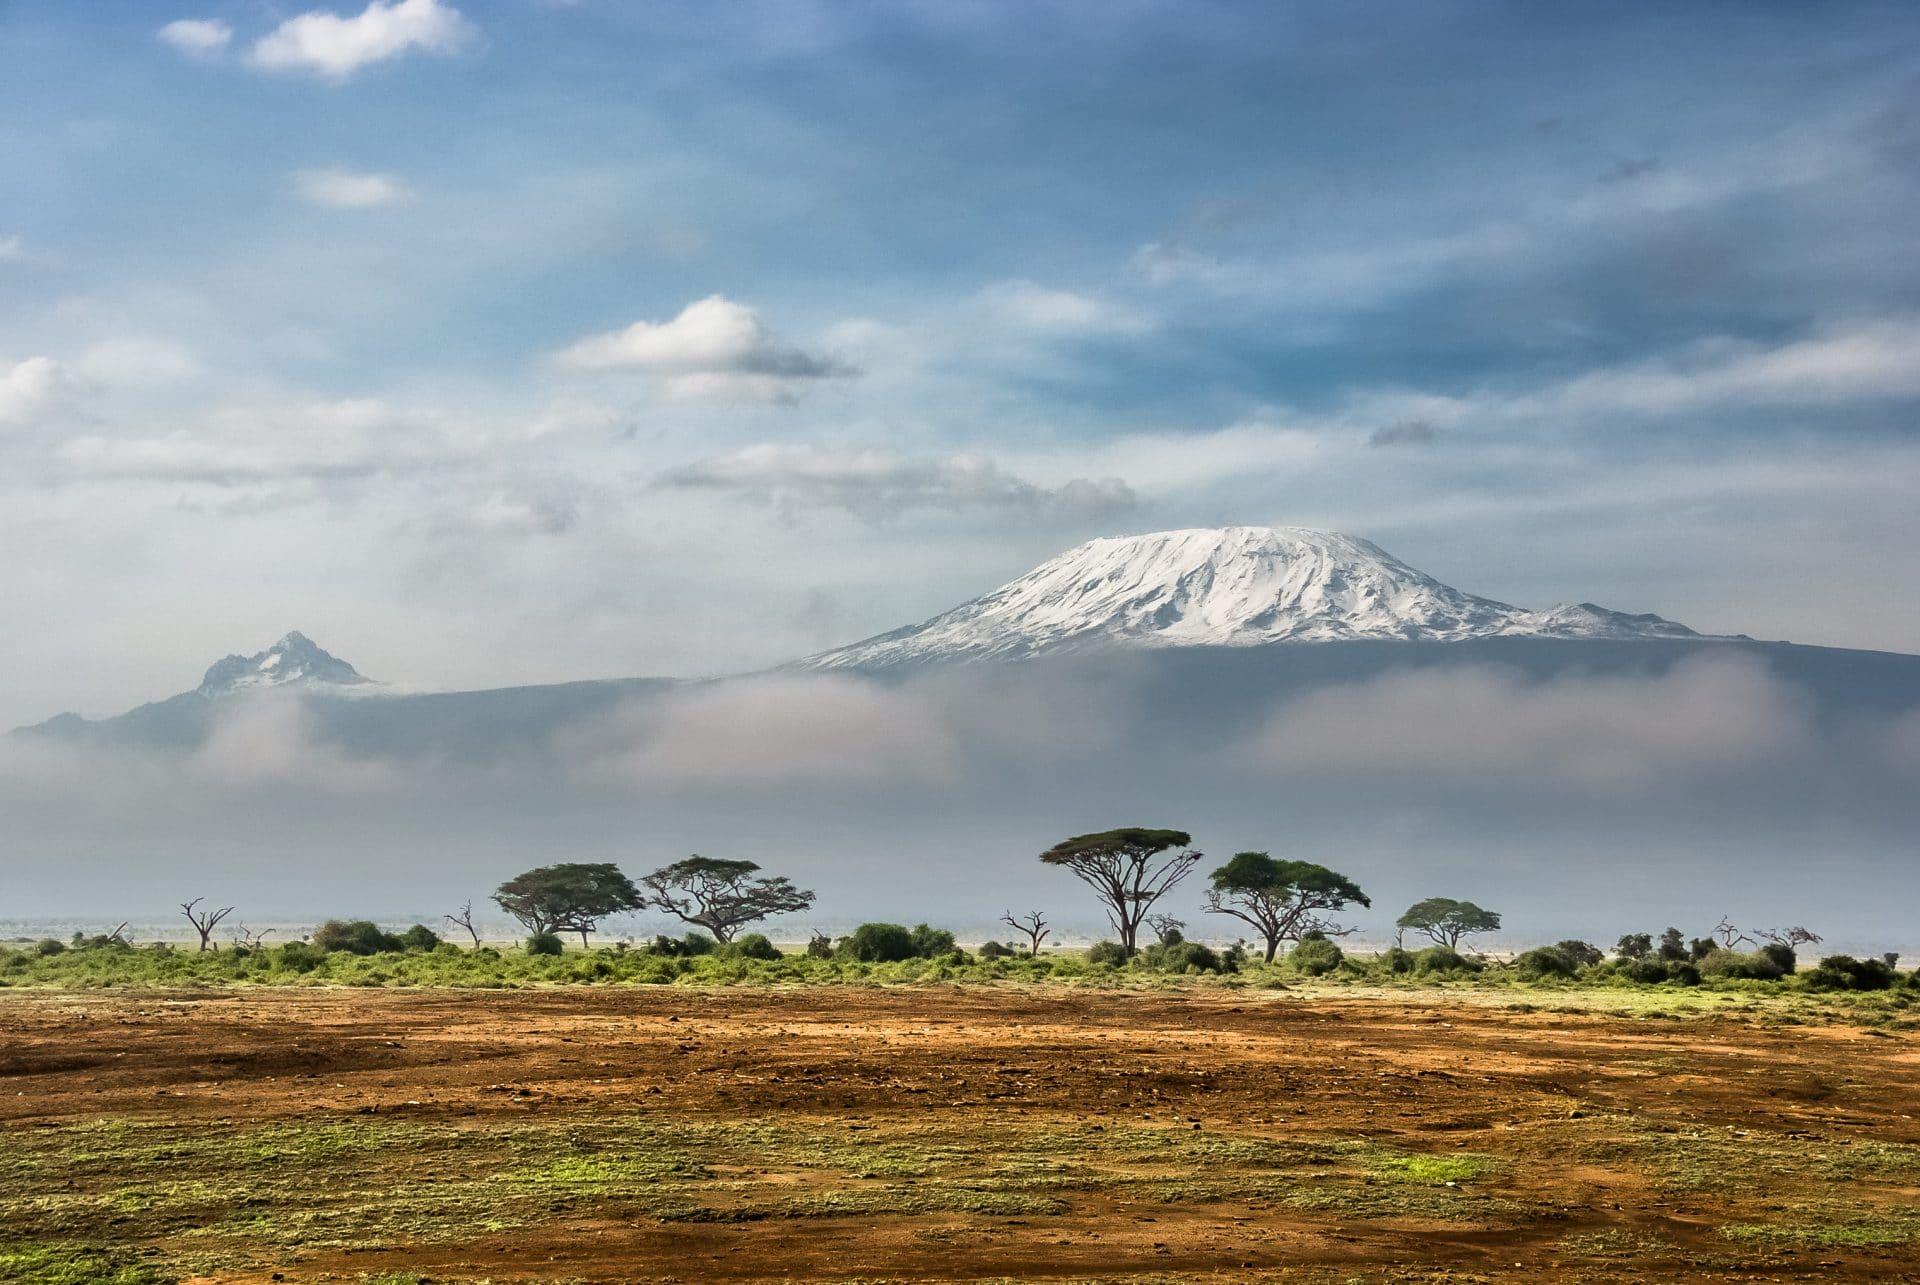 Kilimanjaro Seven Summit